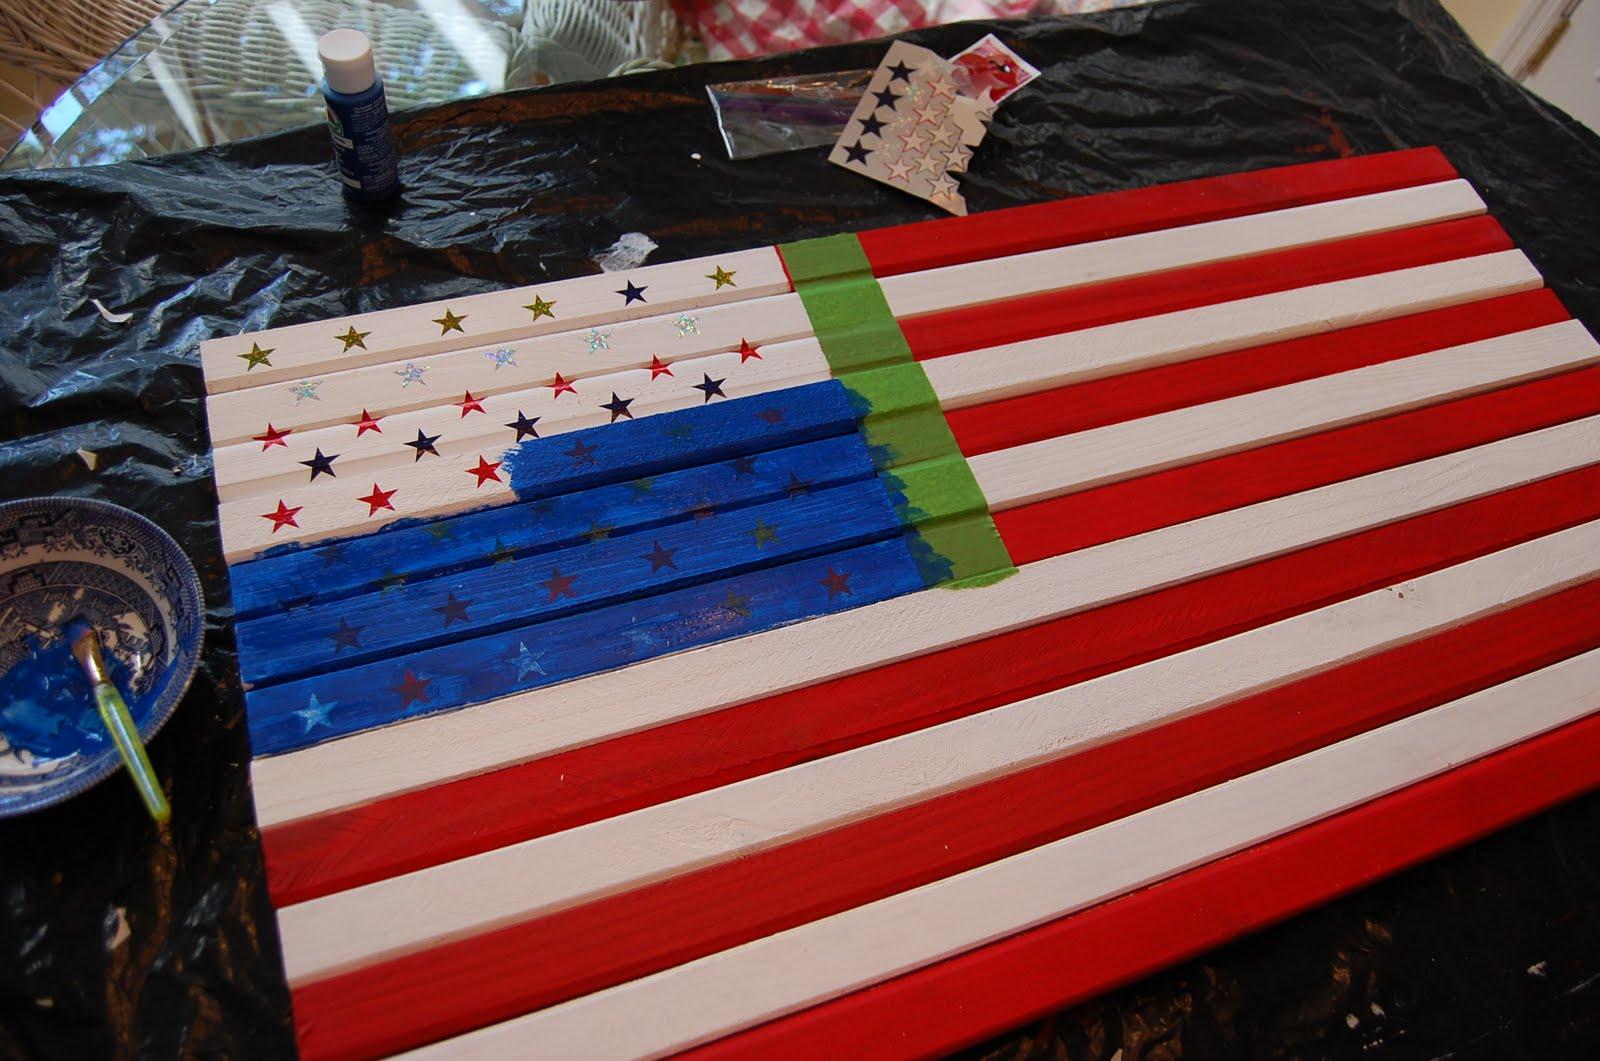 DIY Pottery Barn American Flag Knock Off